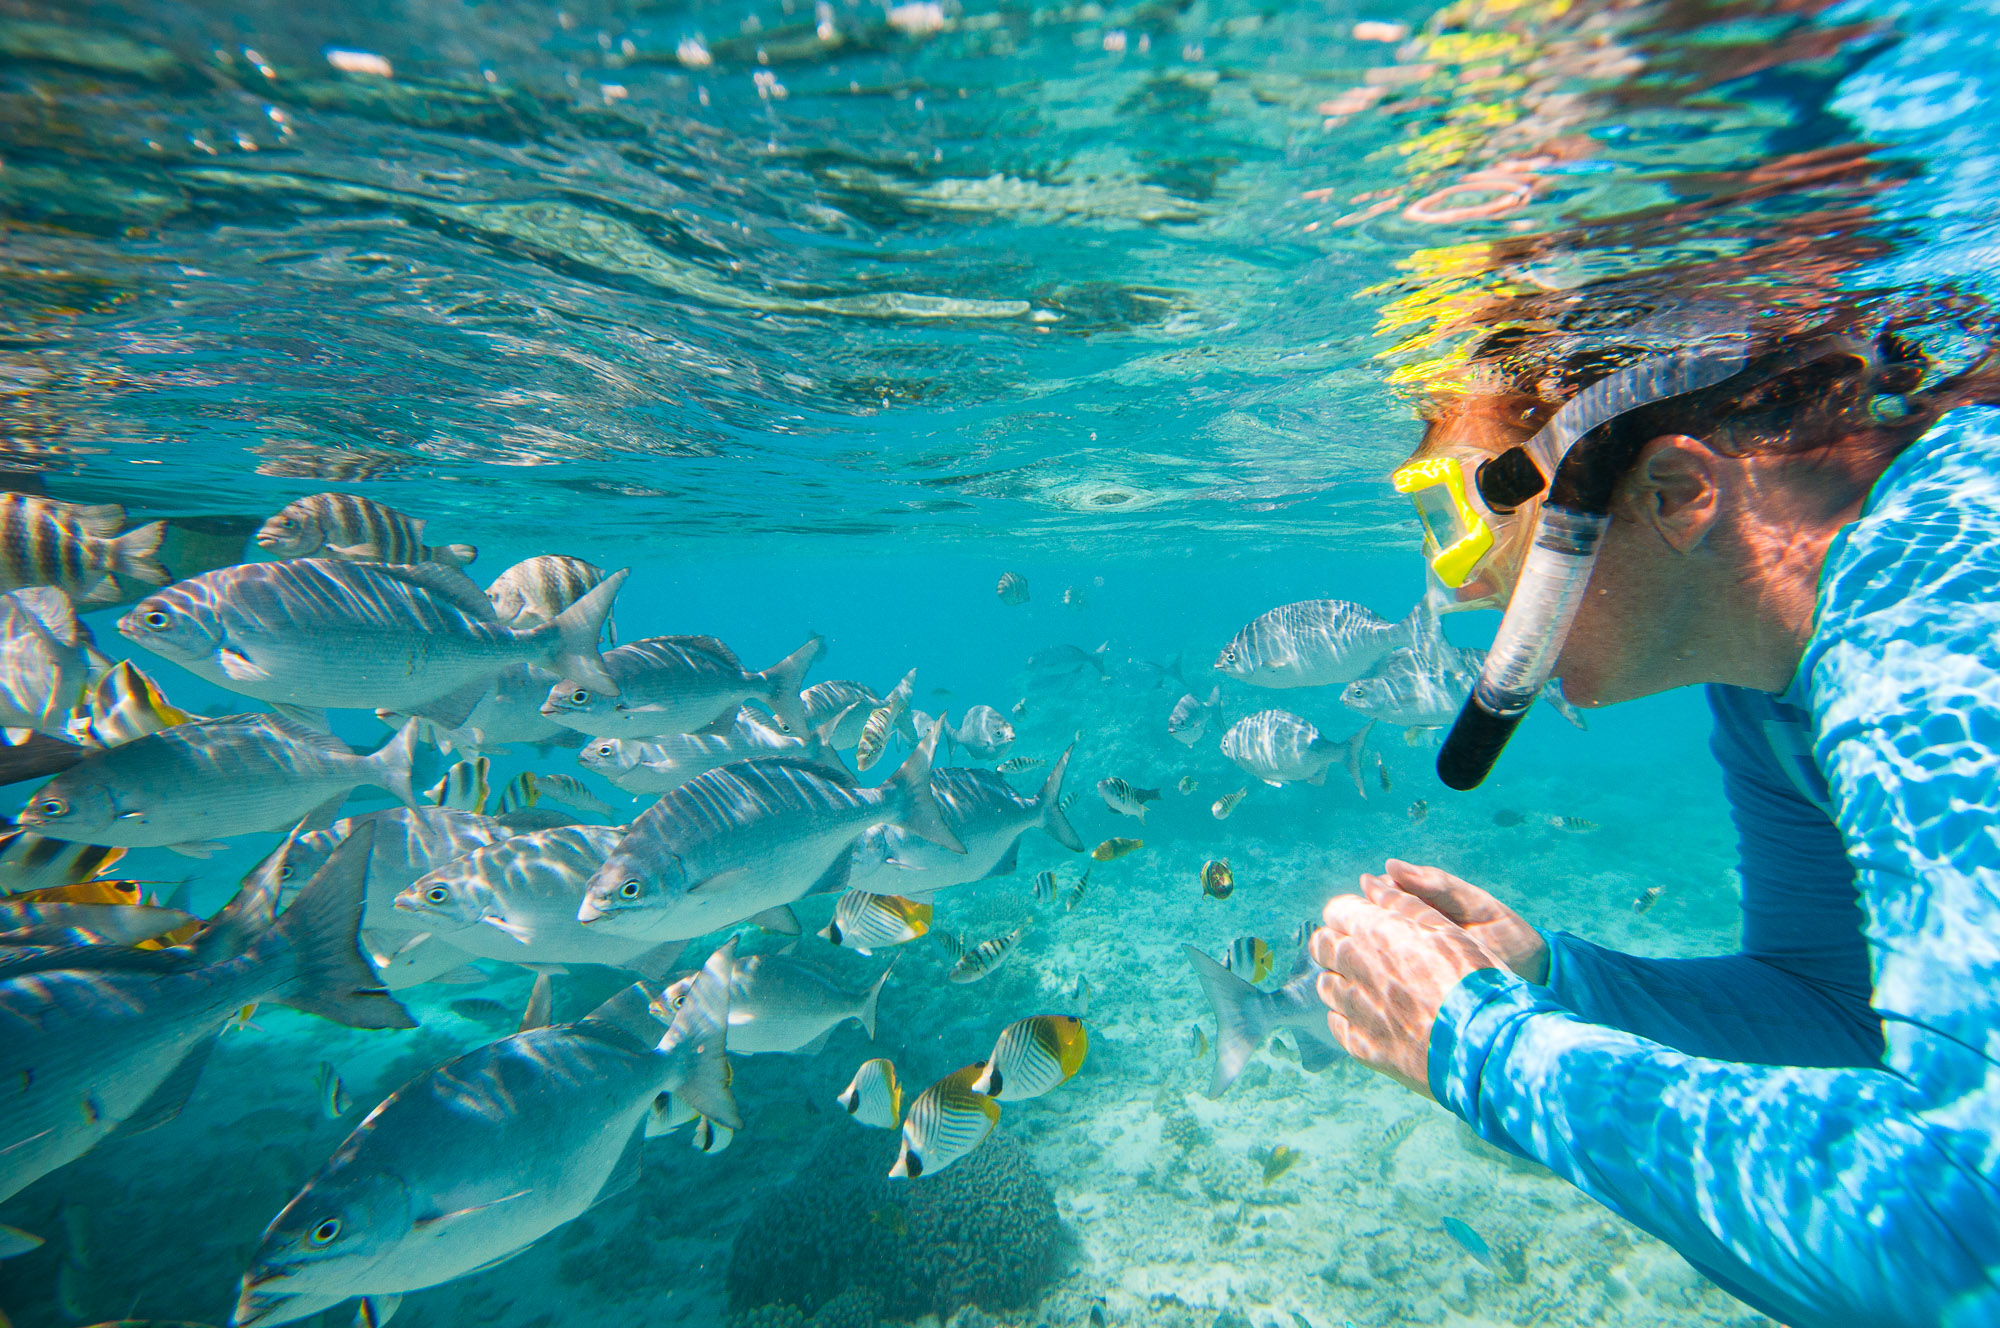 Snorkelling in beautiful Aitutaki Lagoon, Cook Islands. © www.thomaspickard.com